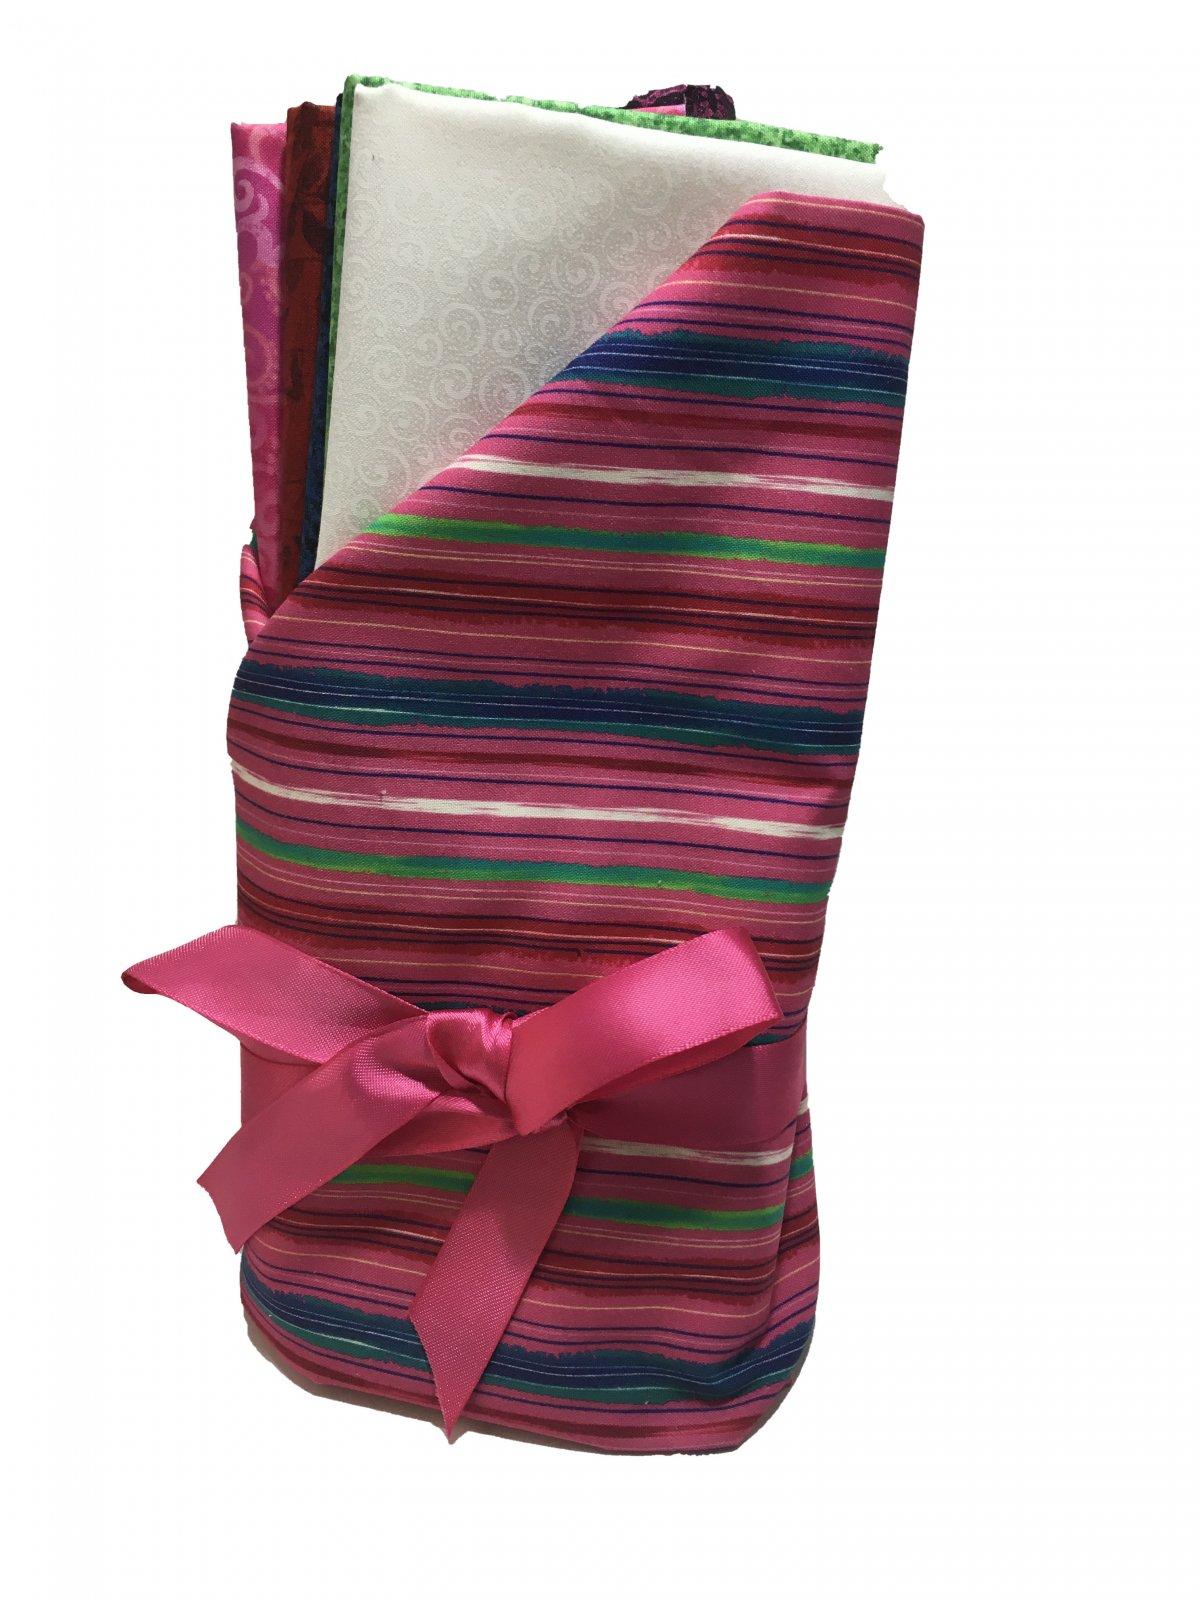 Great Basics Crib Size Quilt Kit Alyssa Pink